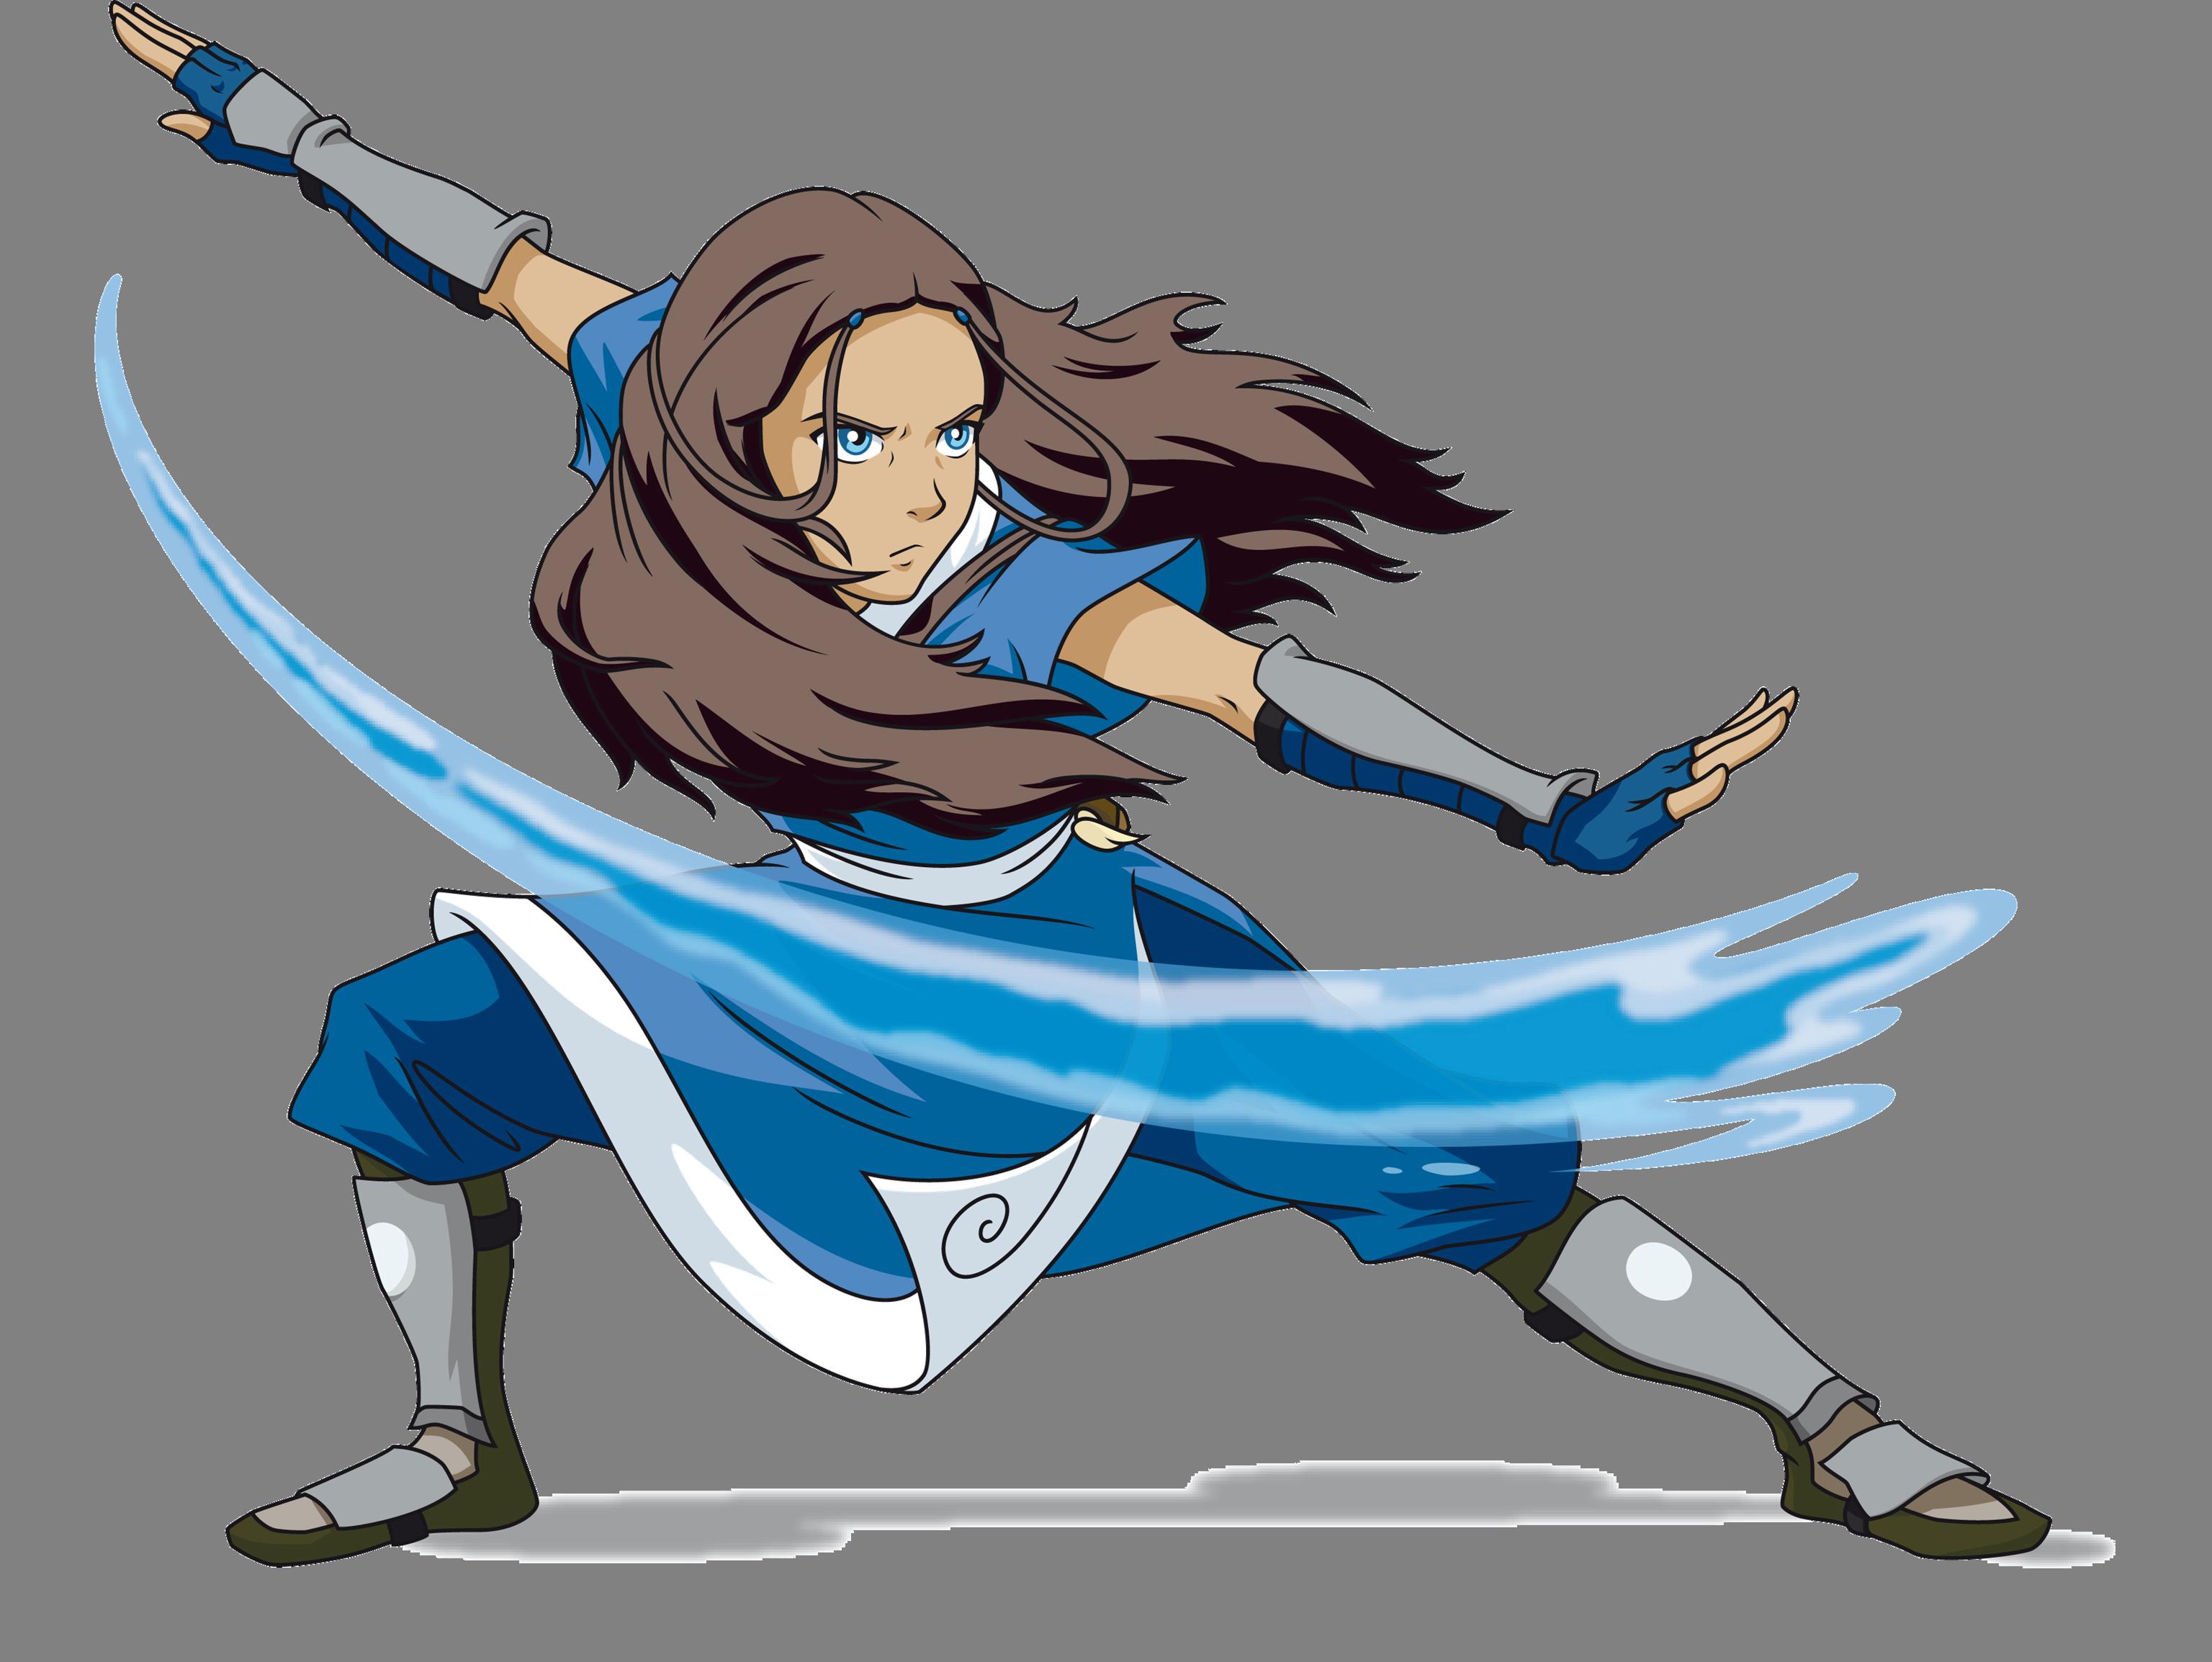 File:Avatar = Katara 001.png